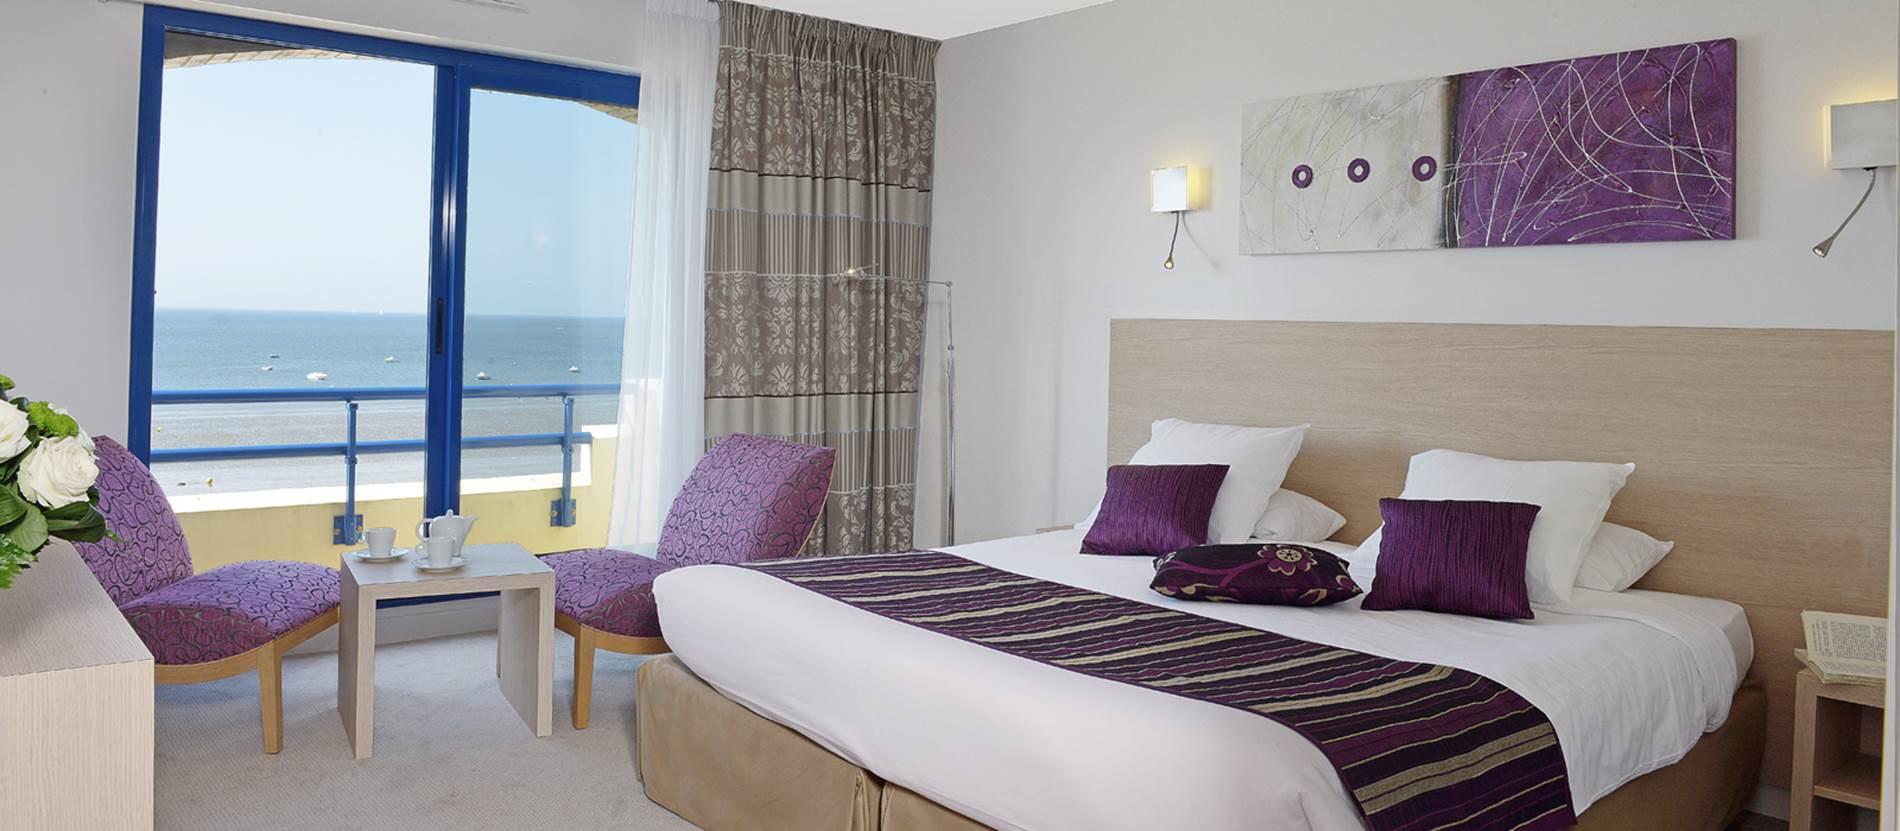 Hotel-de-La-Plage-Damgan-Morbihan-Bretagne-Sud © Hotel-de-La-Plage-Damgan